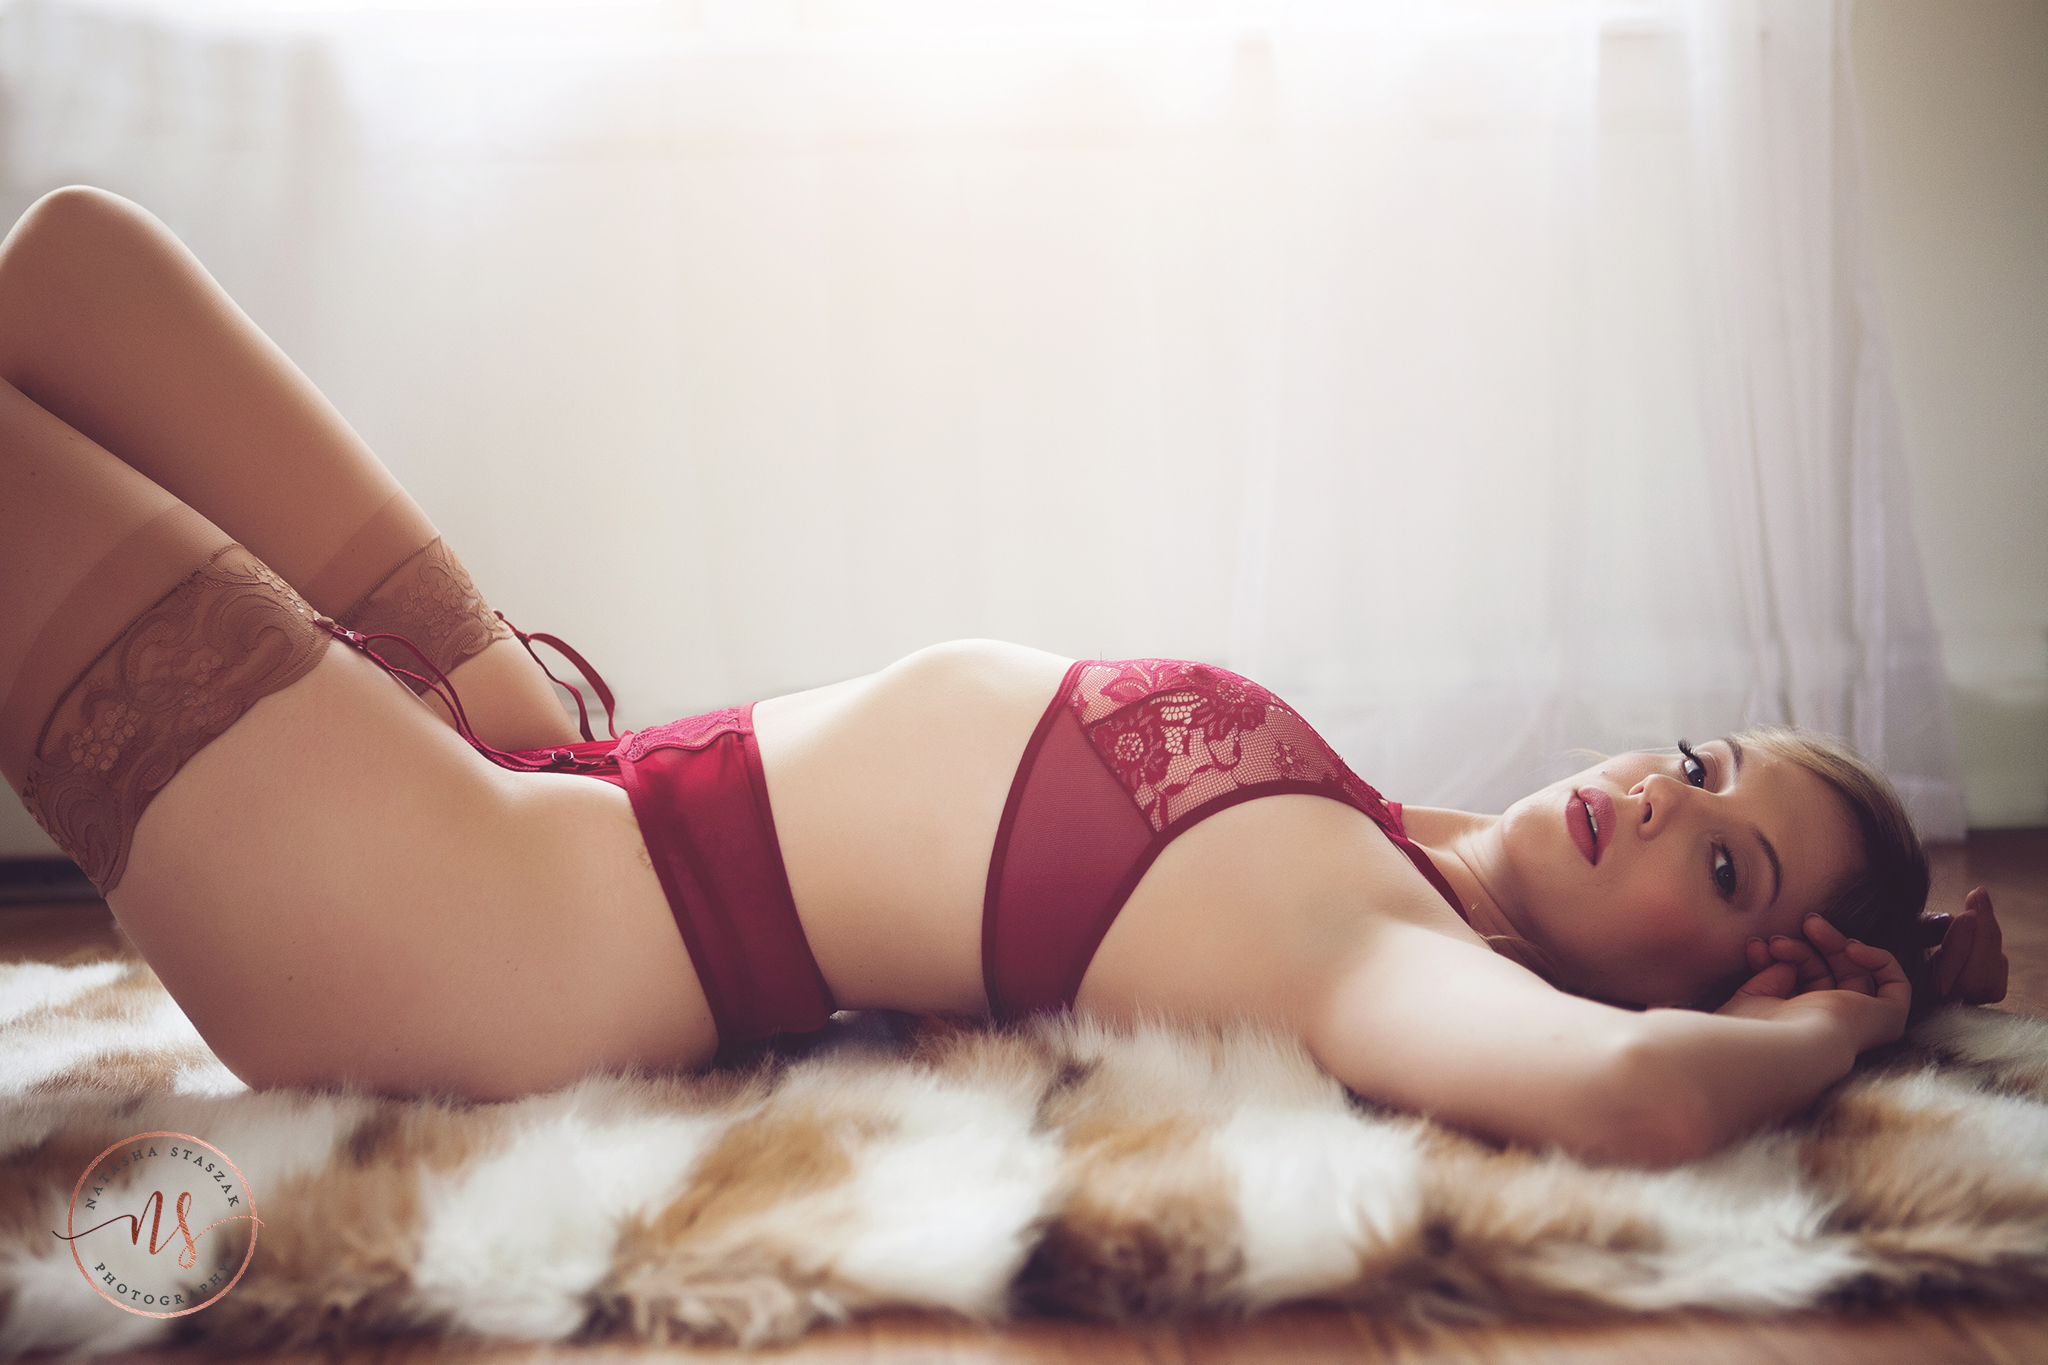 Red lingerie in Buffalo NY Boudoir photo shoot.